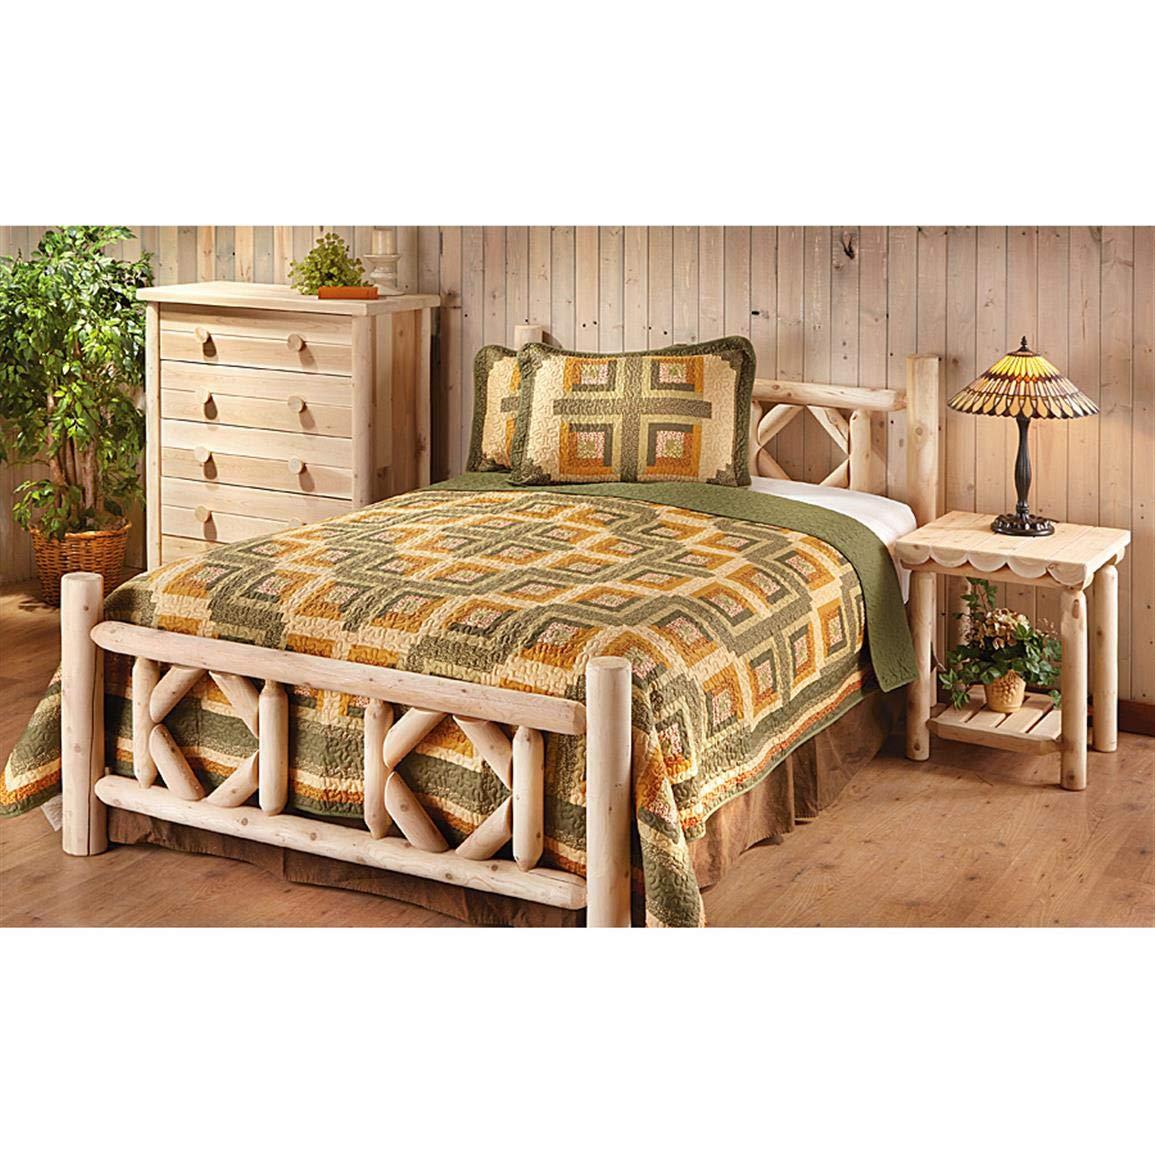 CASTLECREEK Diamond Cedar Log Bed, Full